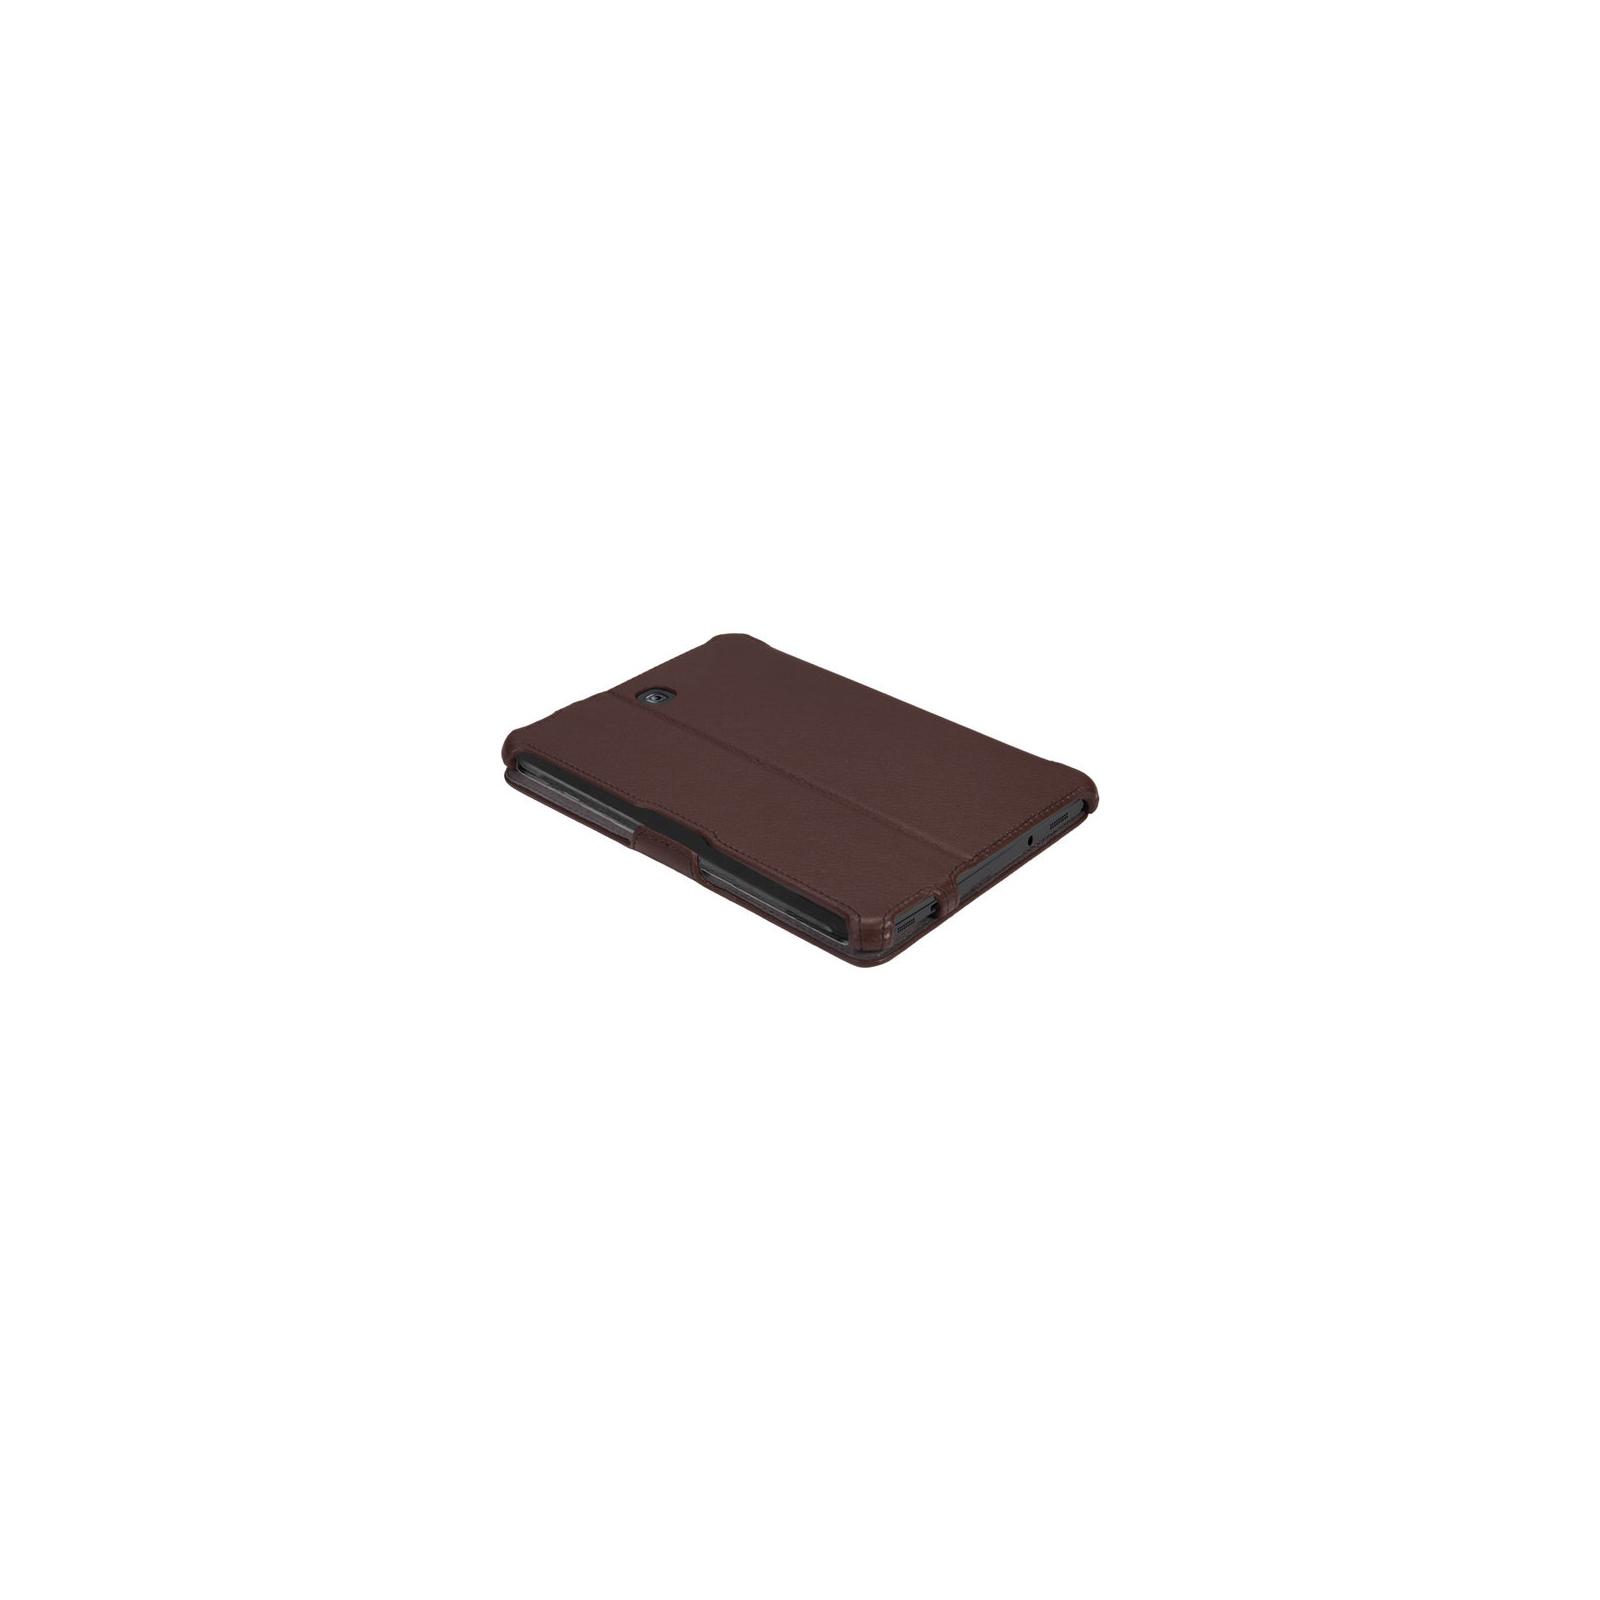 Чехол для планшета AirOn для Samsung Galaxy Tab S 2 8.0 brown (4822352778521) изображение 4